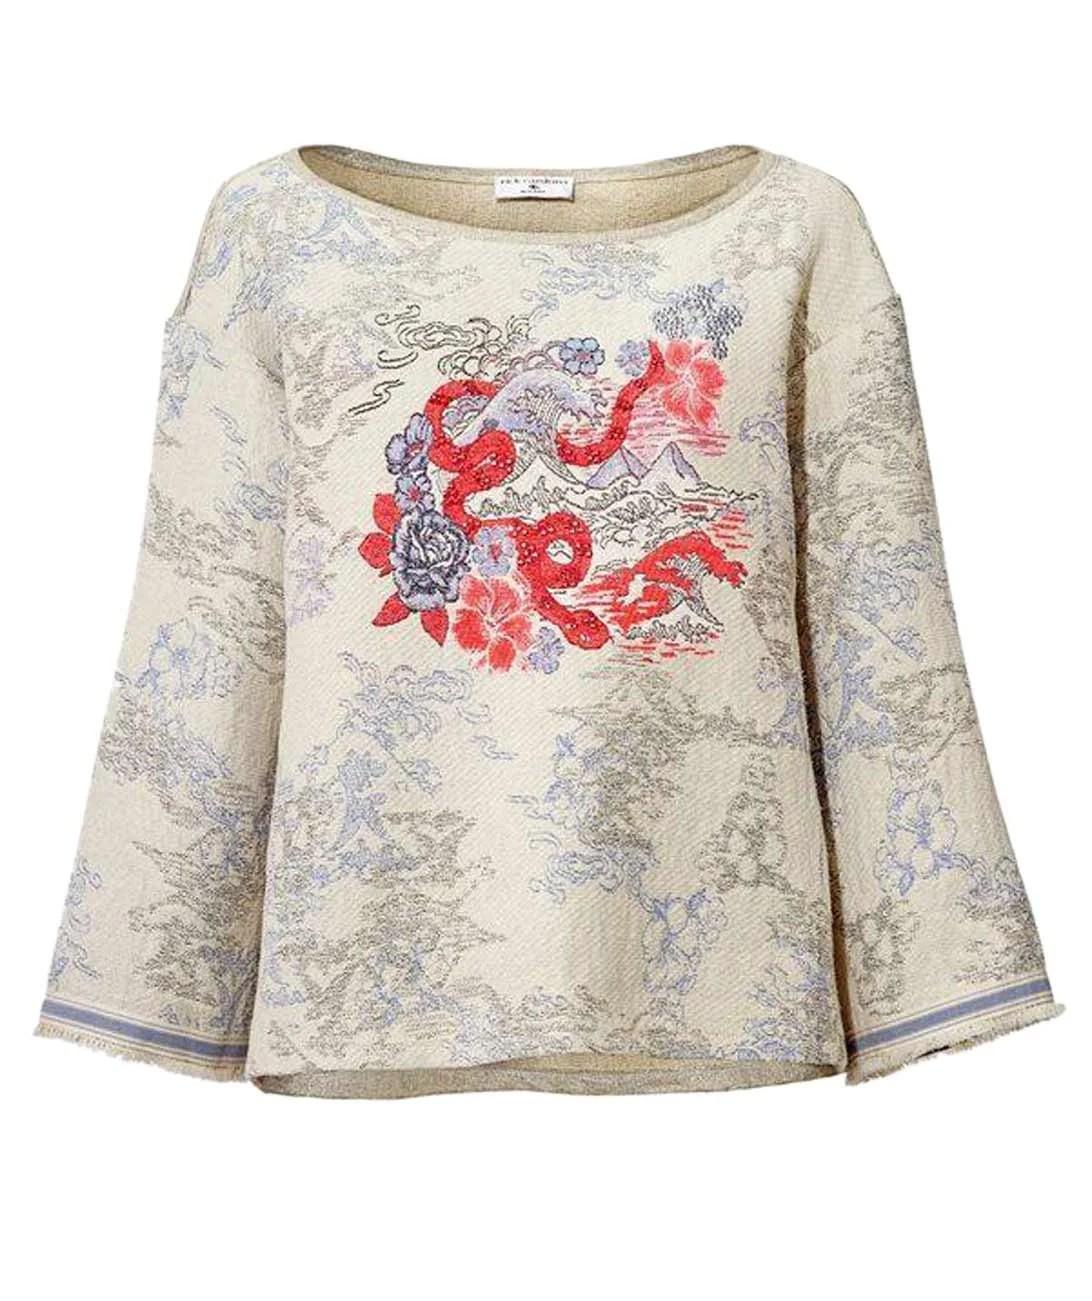 t shirts ohne ärmel RICK CARDONA Damen Designer-Sweatshirt Bunt 080.978 Missforty